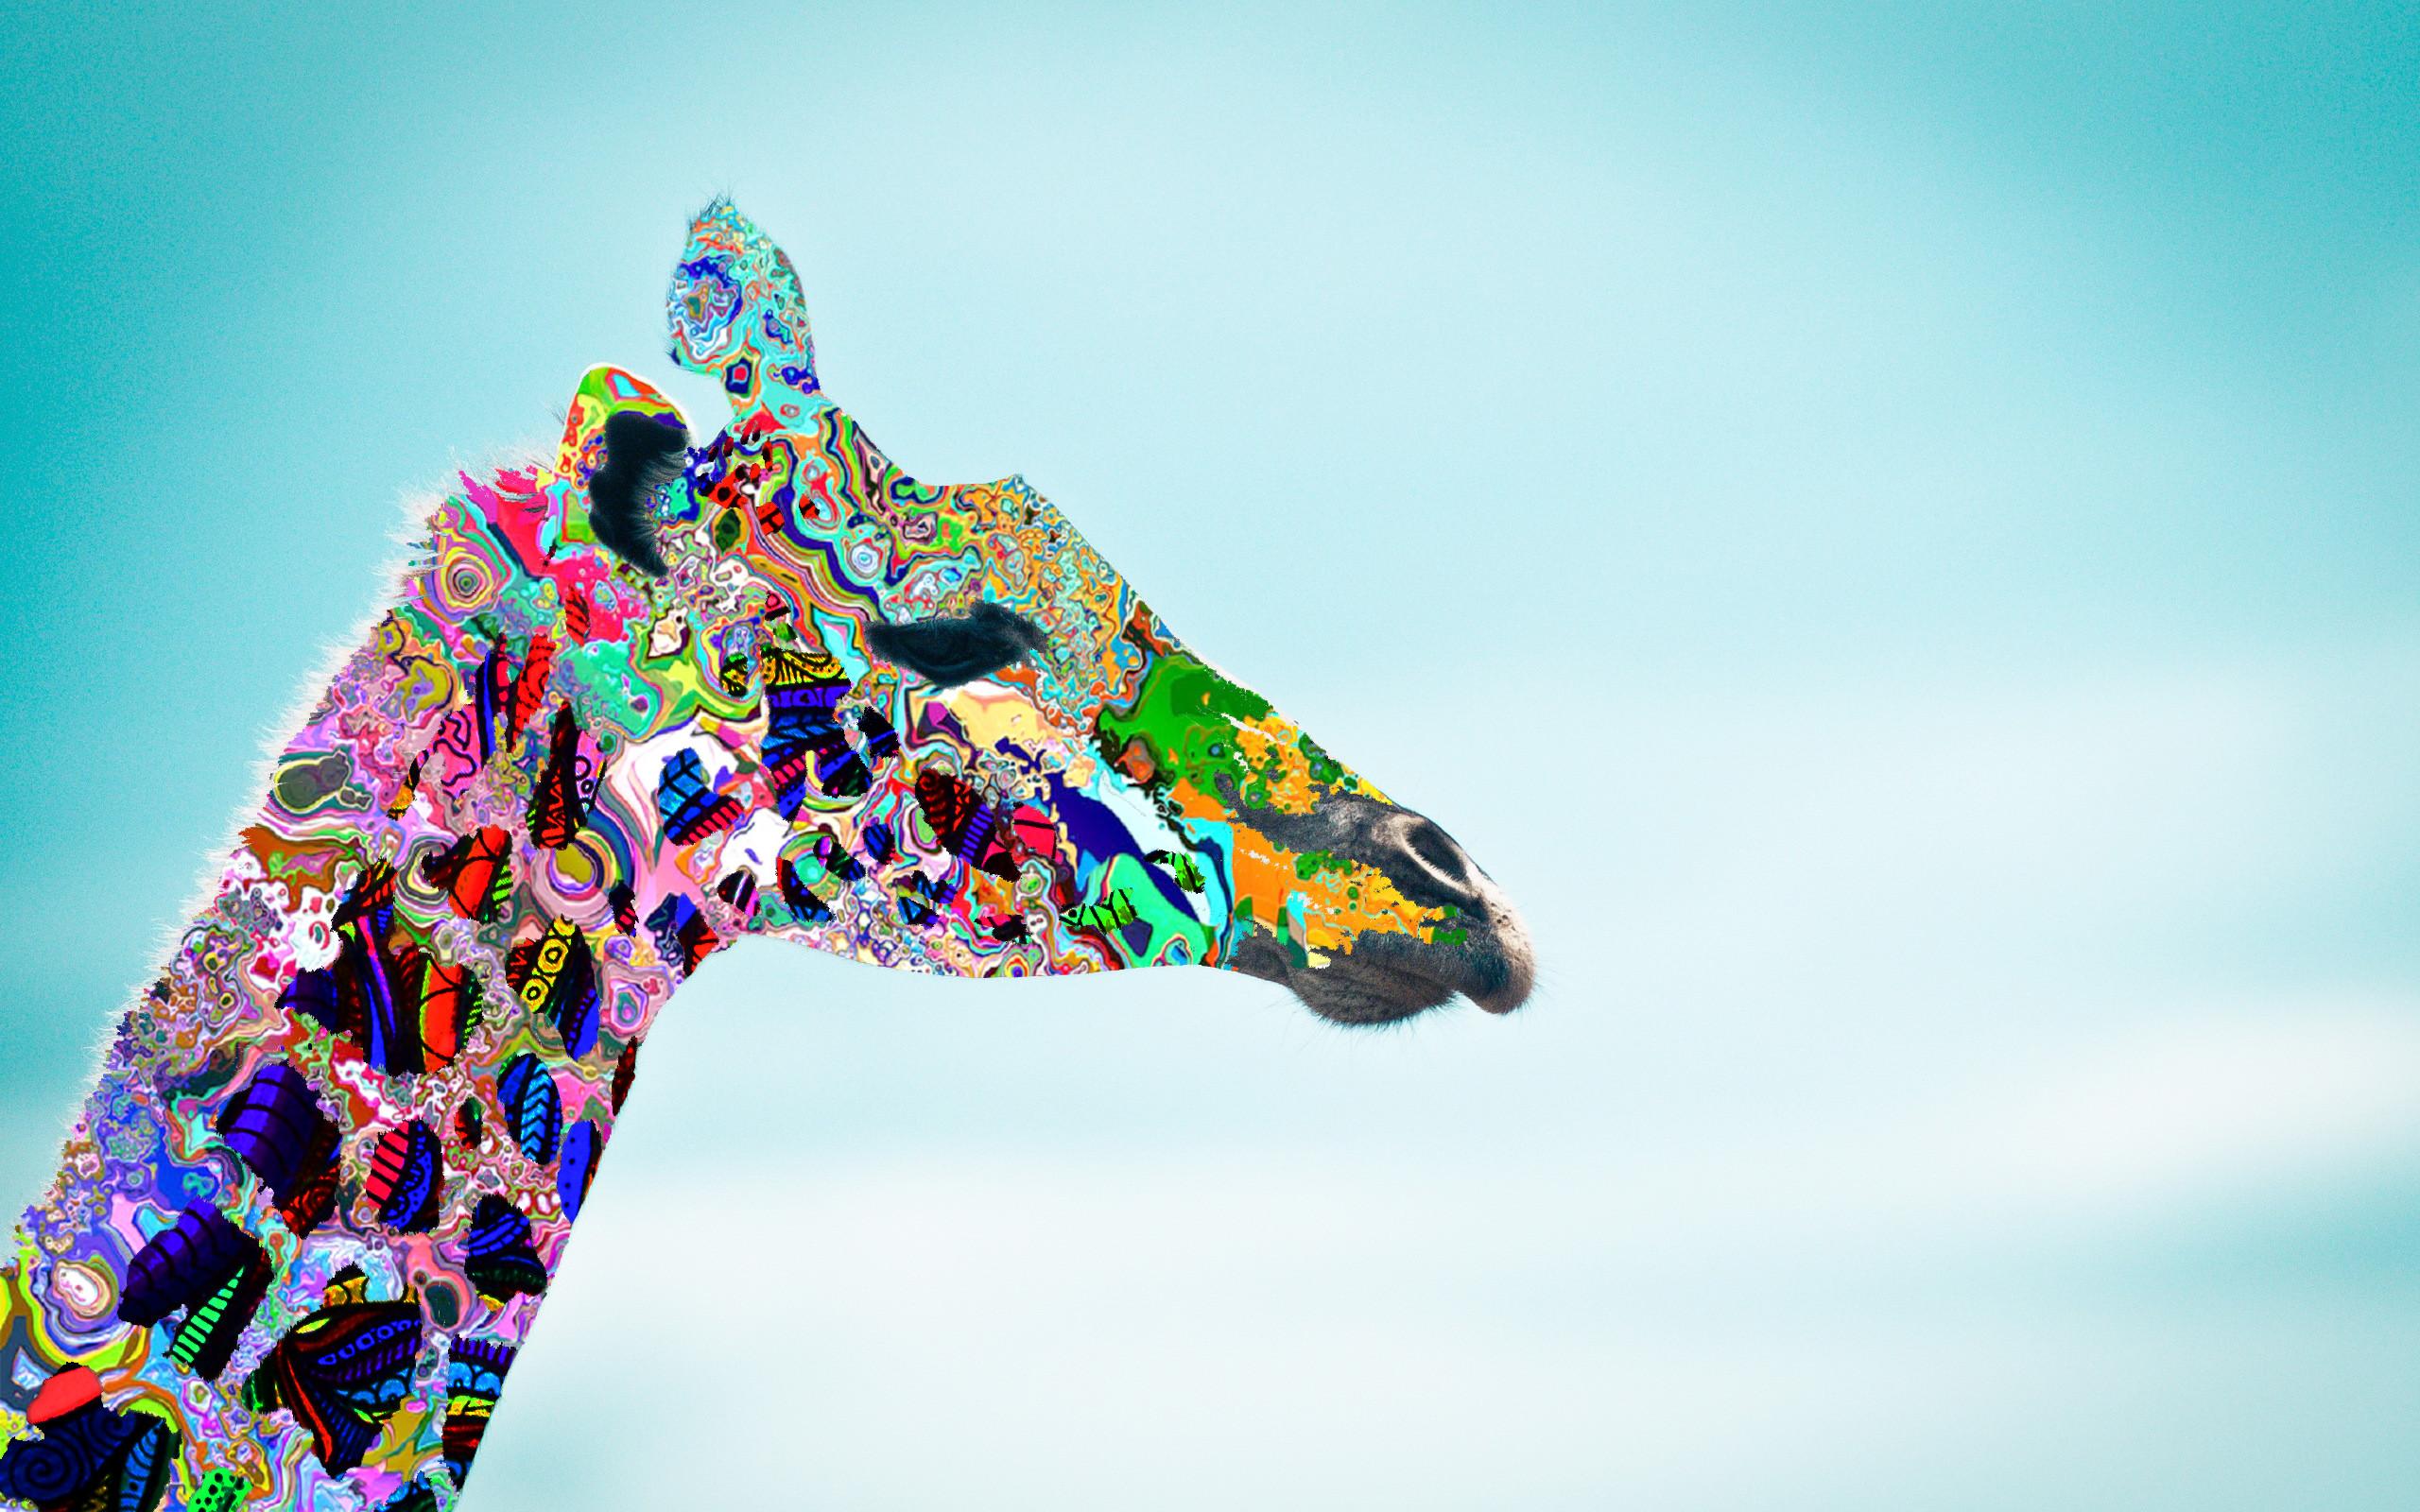 13 Inch Laptop Cute Wallpaper Giraffe Desktop Background 75 Pictures